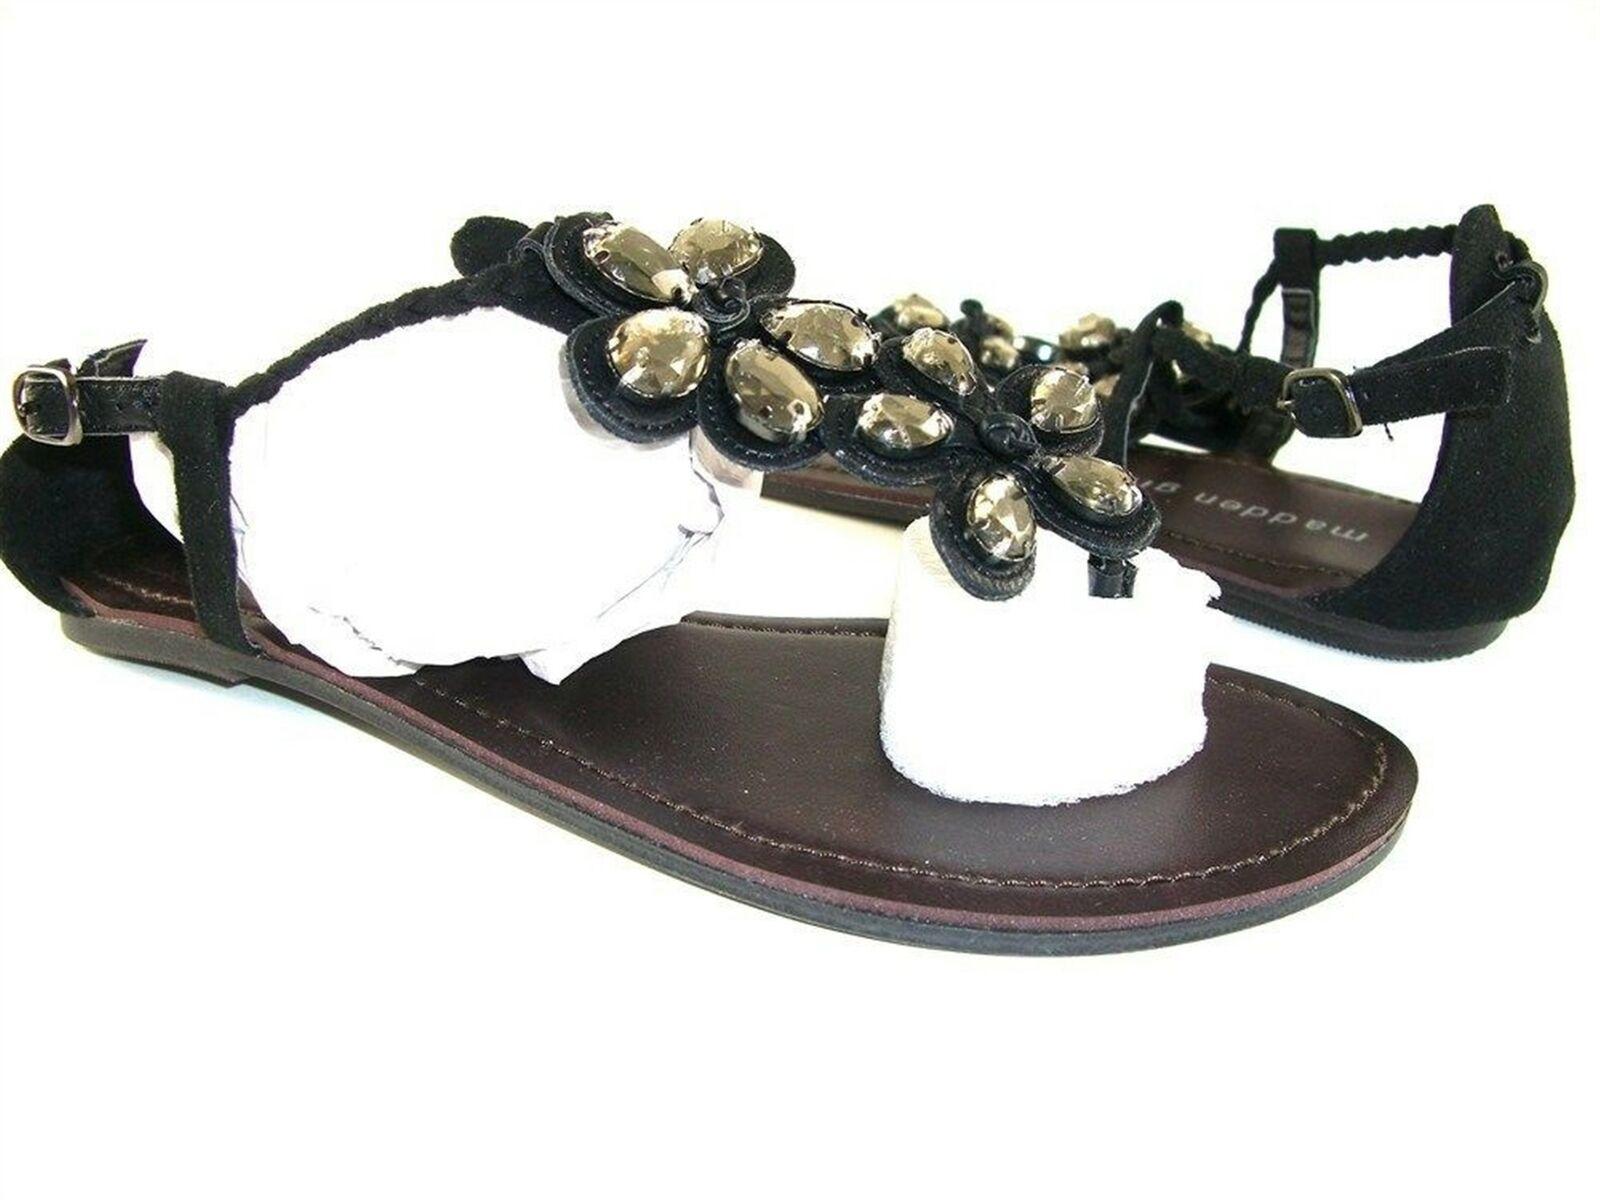 Madden Girl Women's Amithyst Thong Sandals Size 9 M